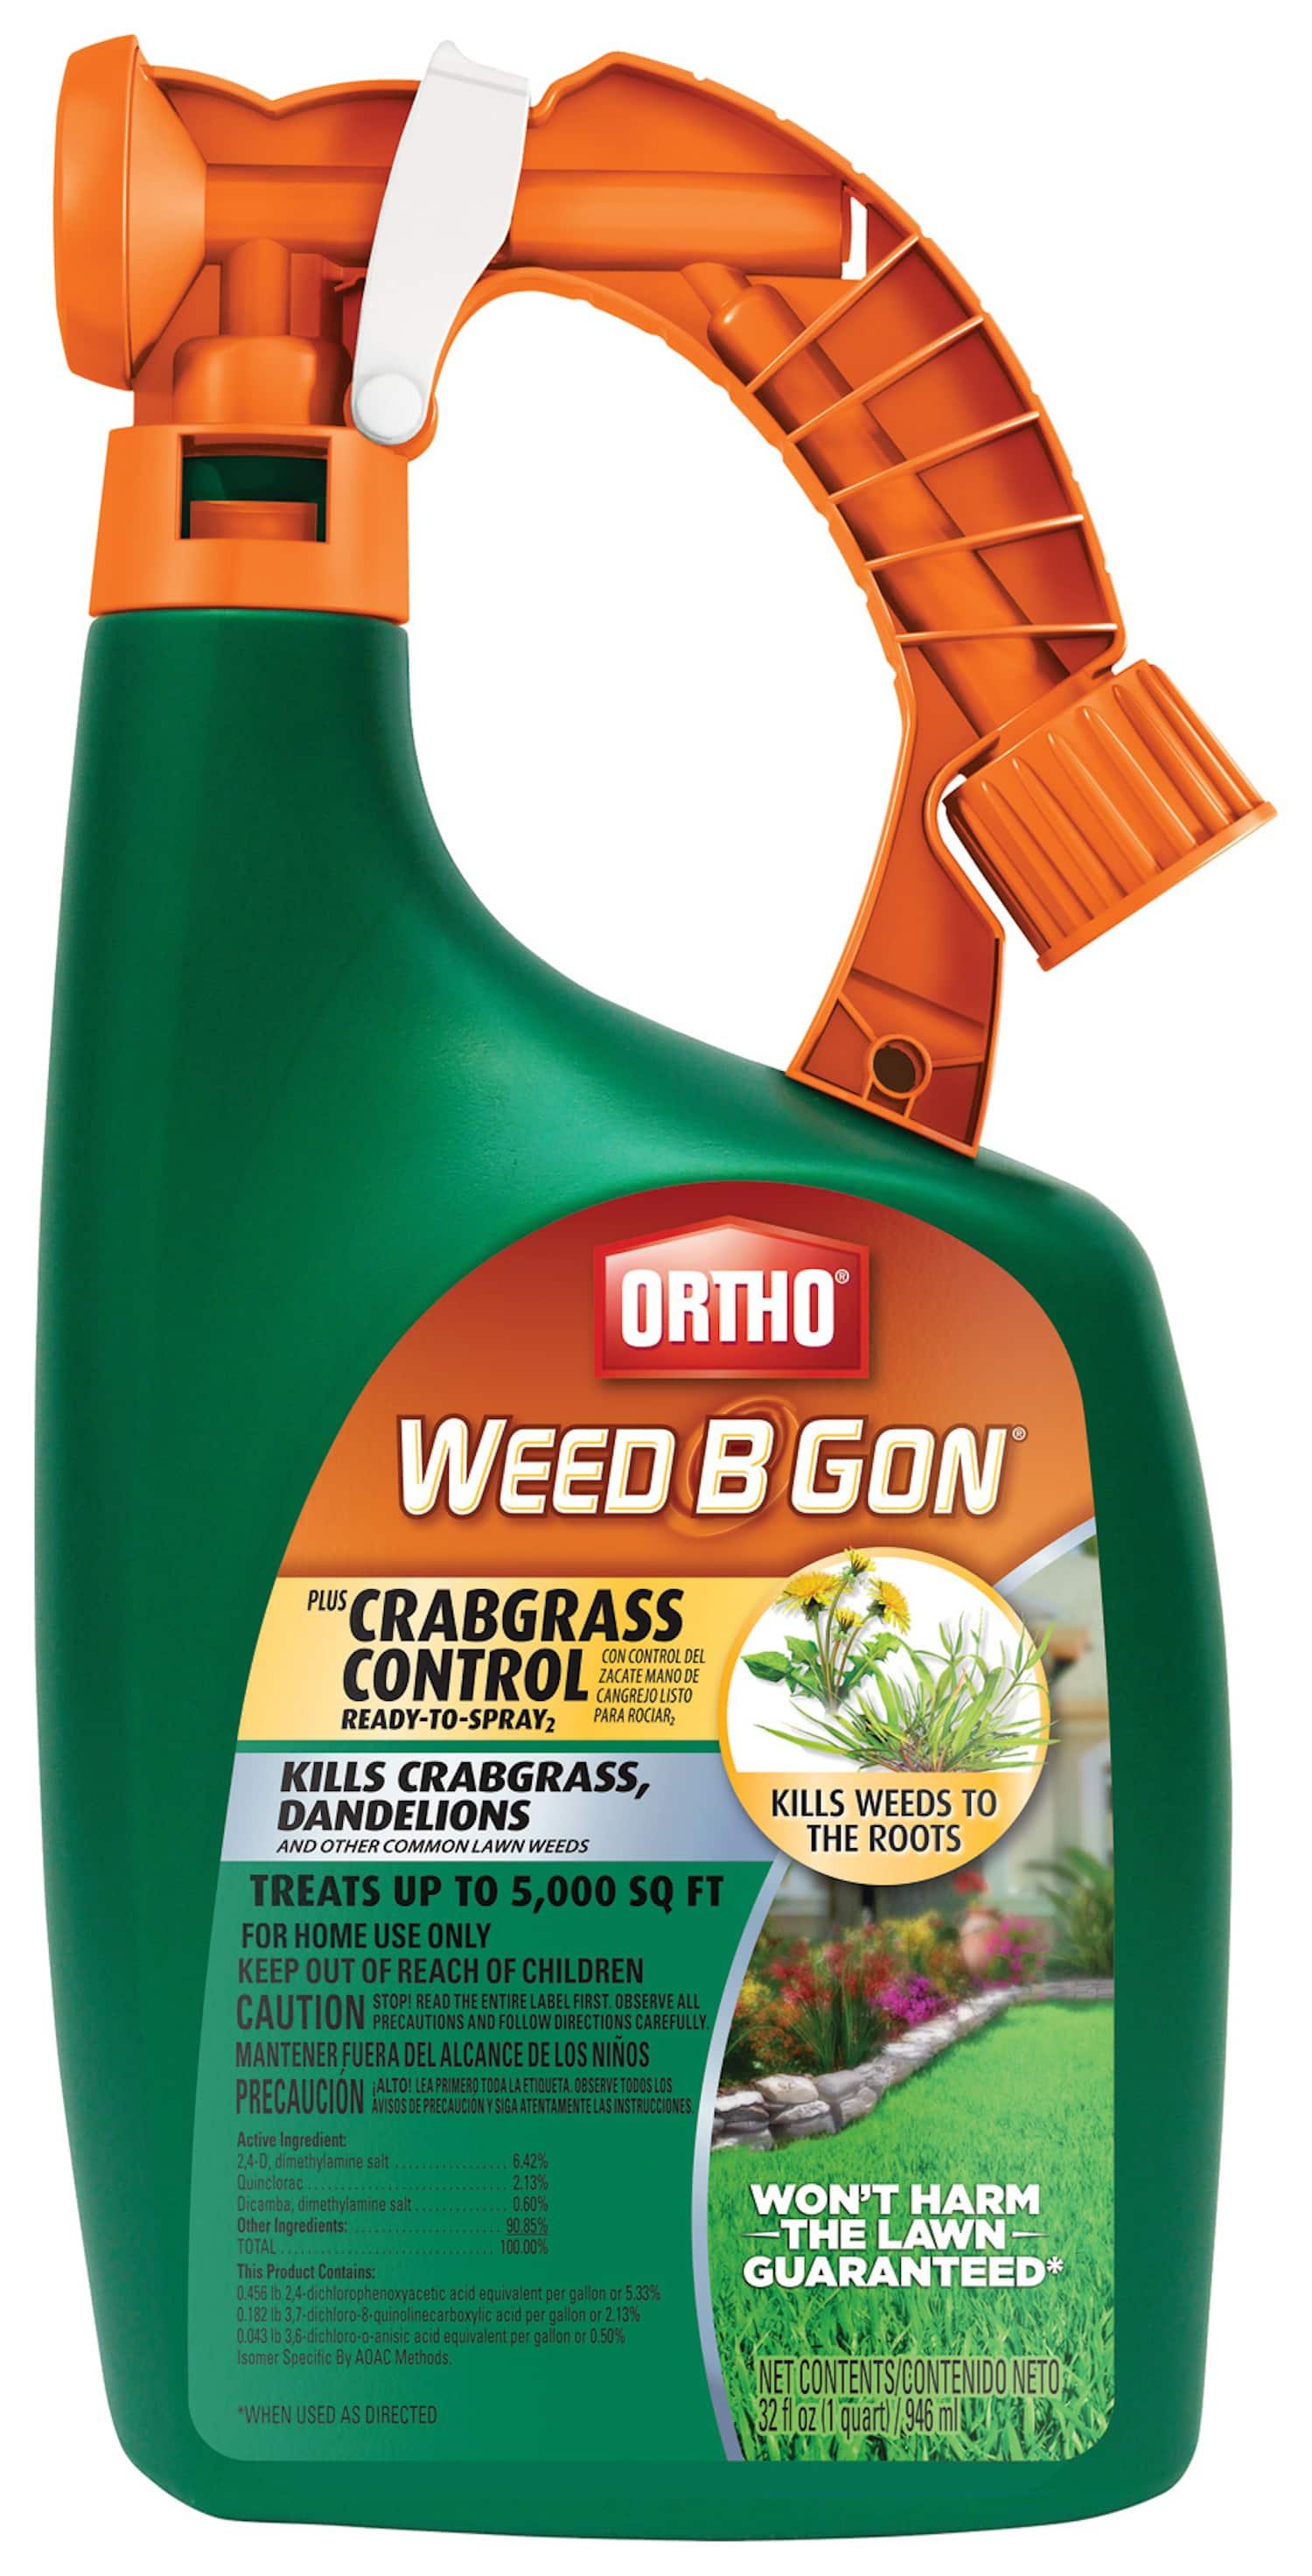 32oz Ortho Weed-B-Gon Ready-To-Spray Plus Crabgrass Control